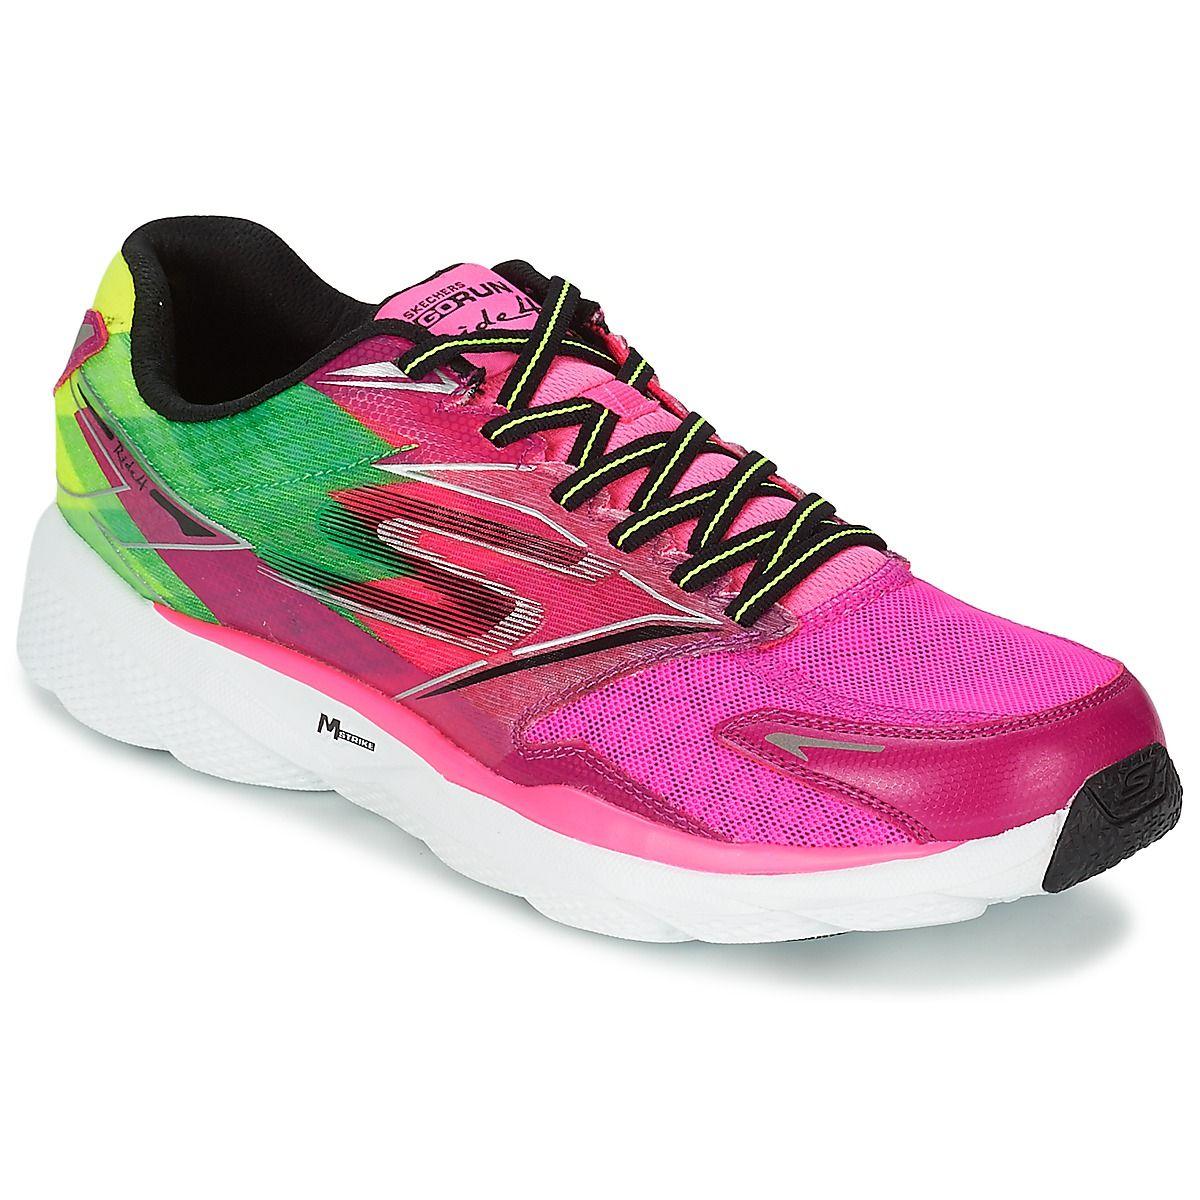 Chaussures de running Skechers GO RUN RIDE 4 Rose prix promo Baskets Femme  Skechers Spartoo Spartoo